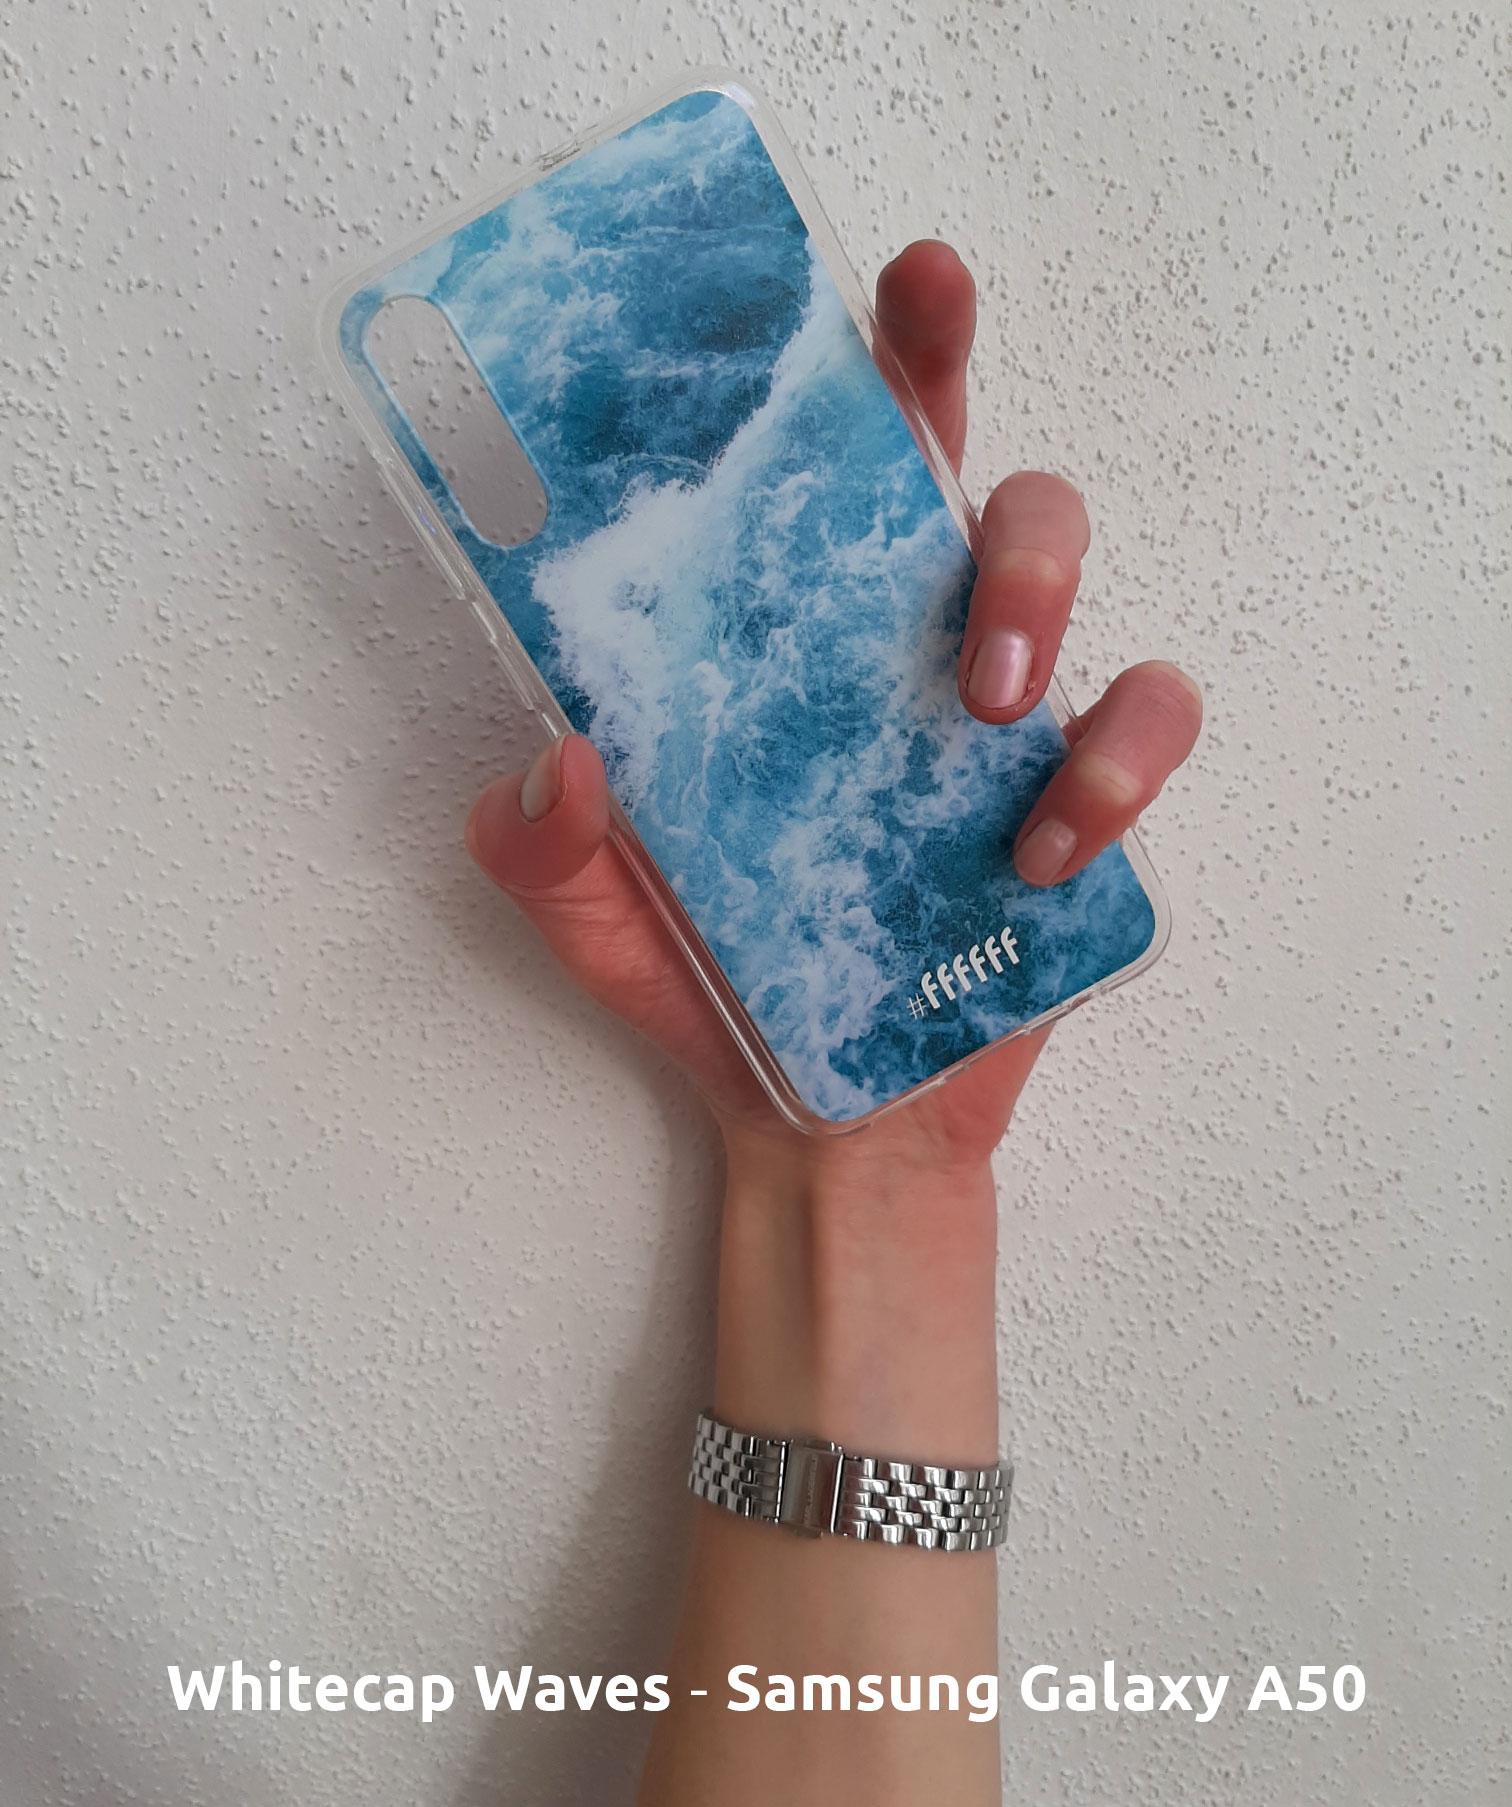 Whitecap Waves - Samsung Galaxy A50